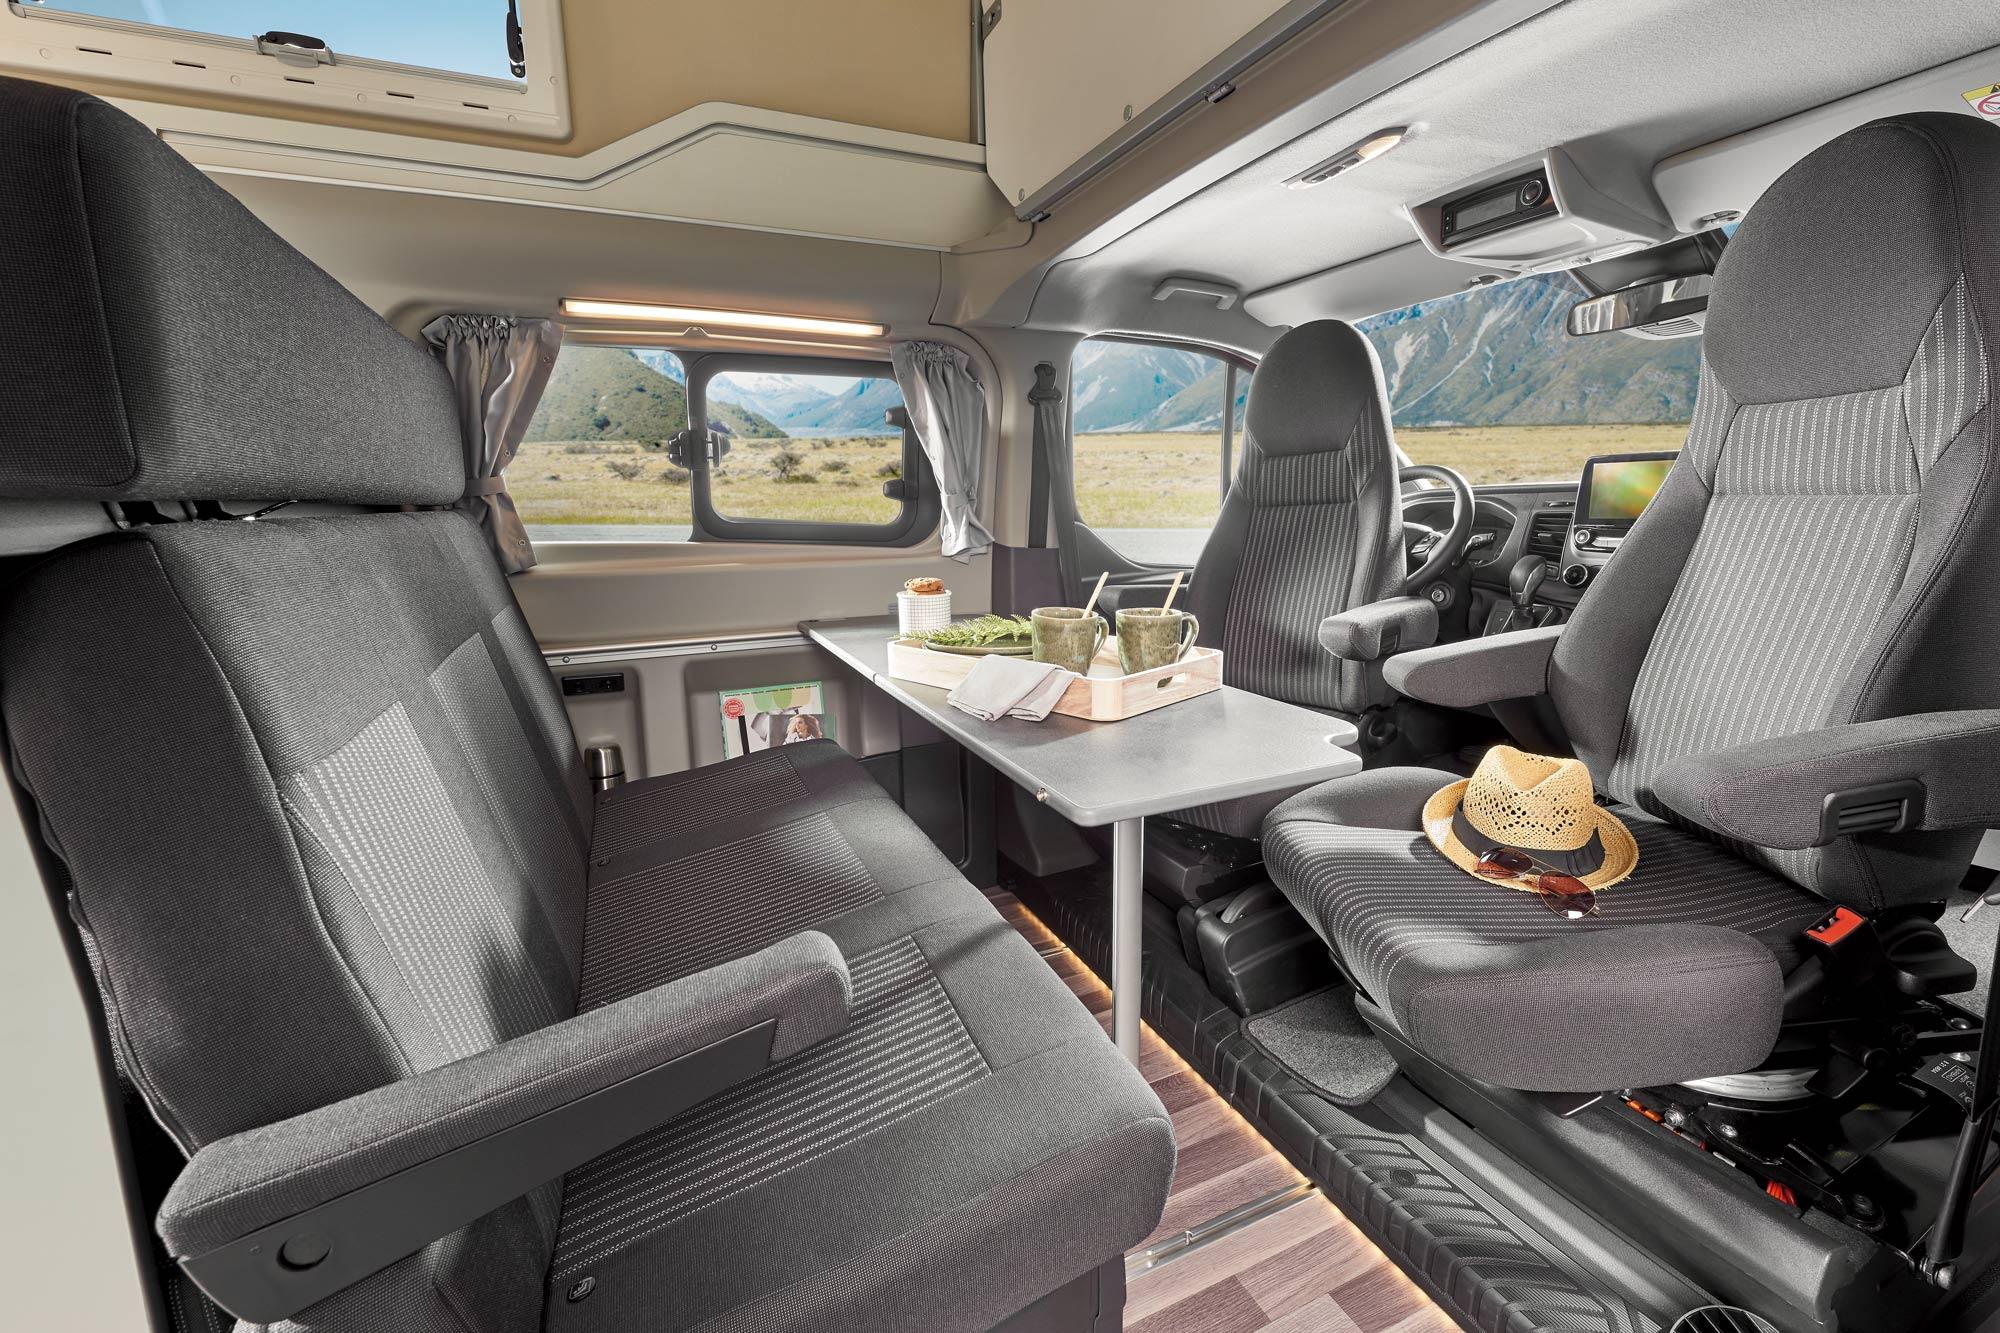 The Nugget Plus Highroof Westfalia Mobil Gmbh